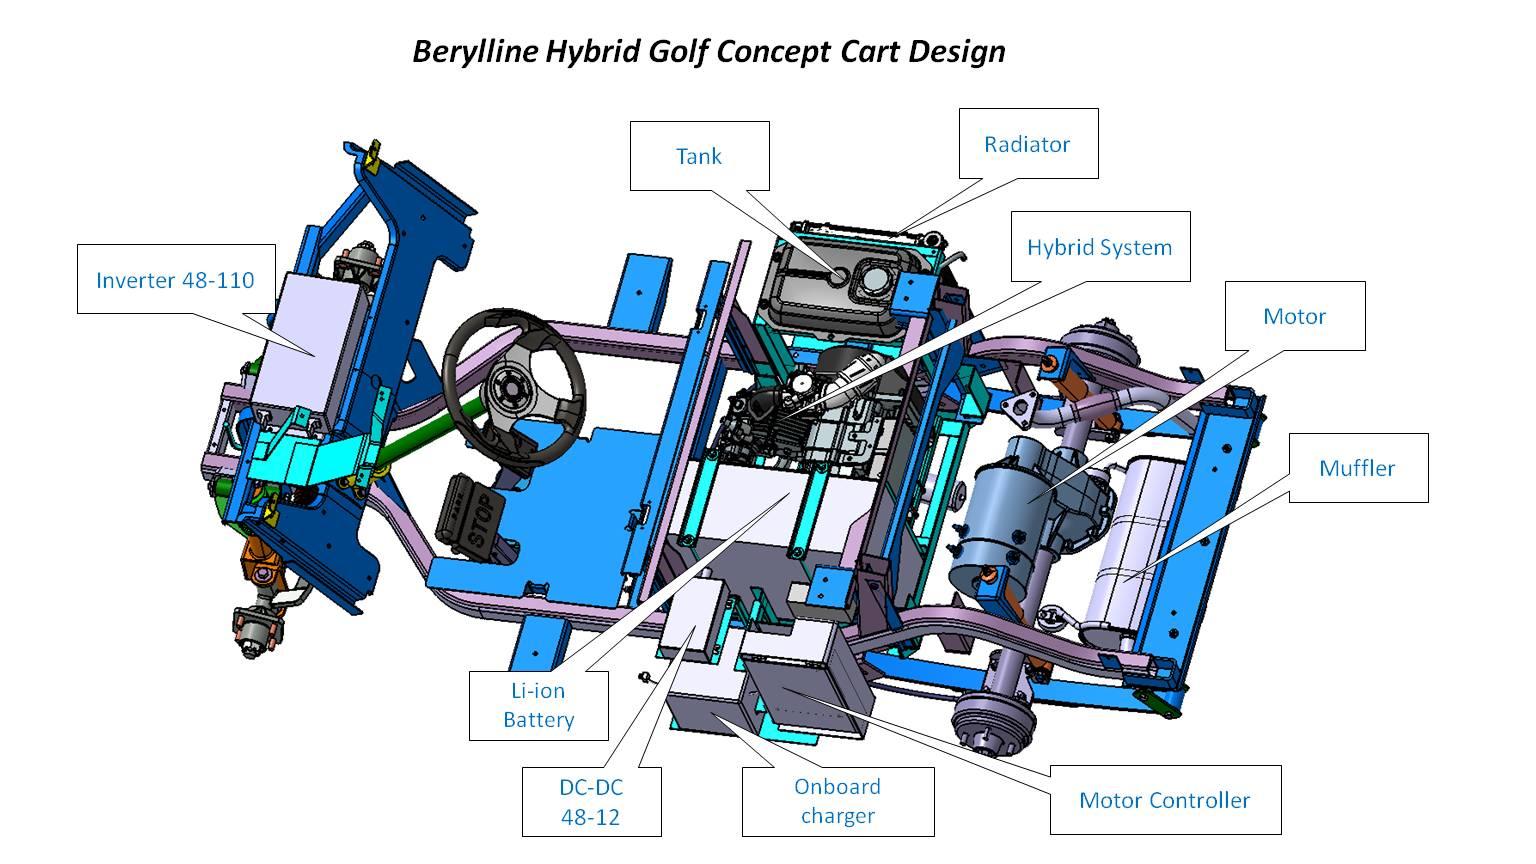 Berylline Hybrid Golf Concept Cart Design